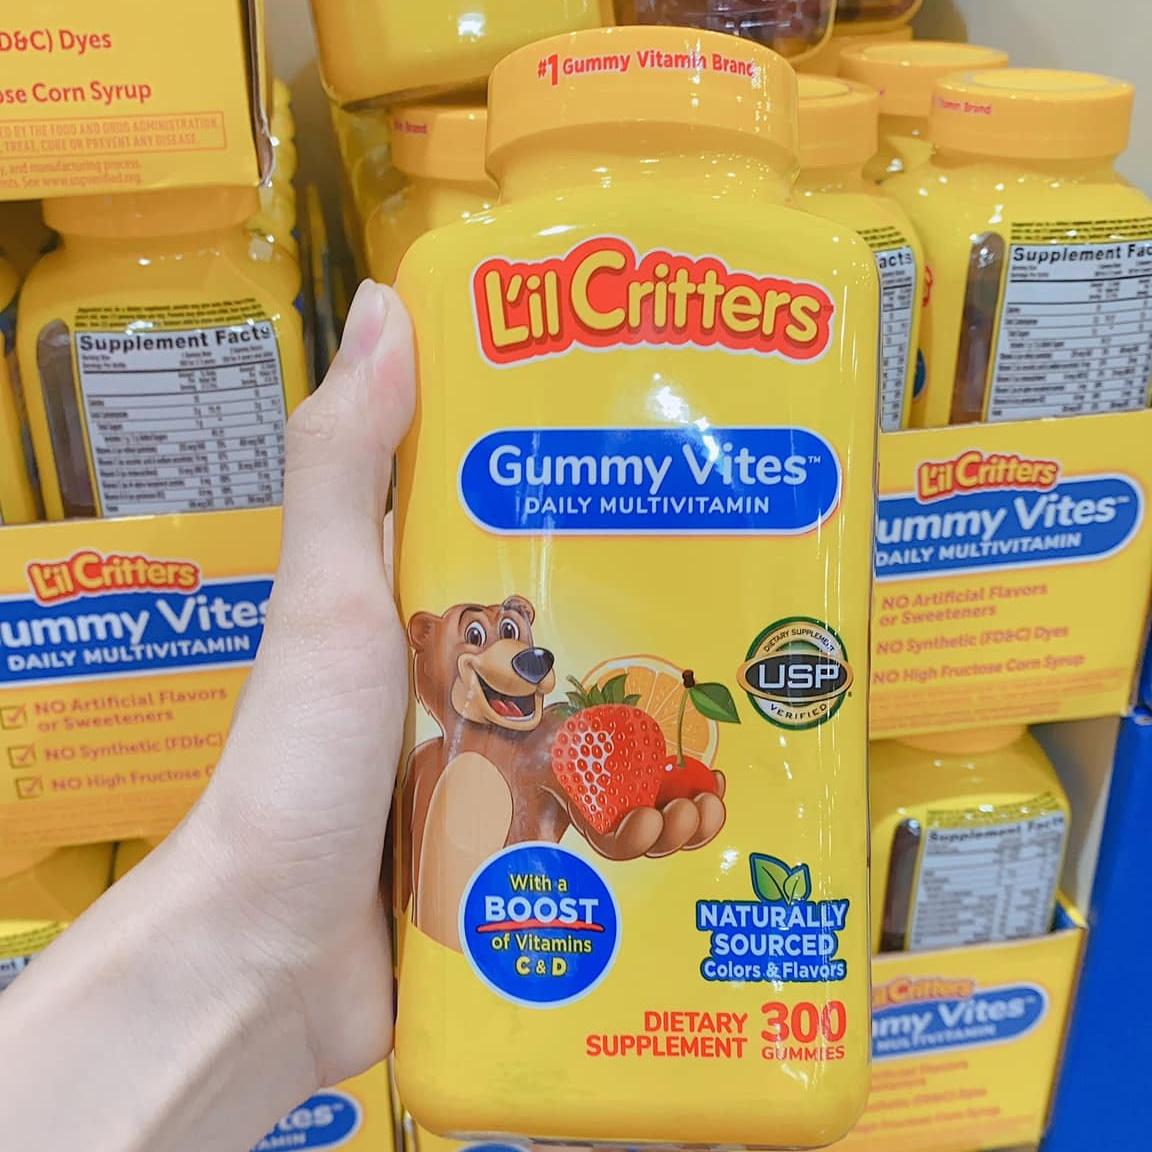 Vitafusion L'il Critters Gummy Vites, 300 Gummy Bears